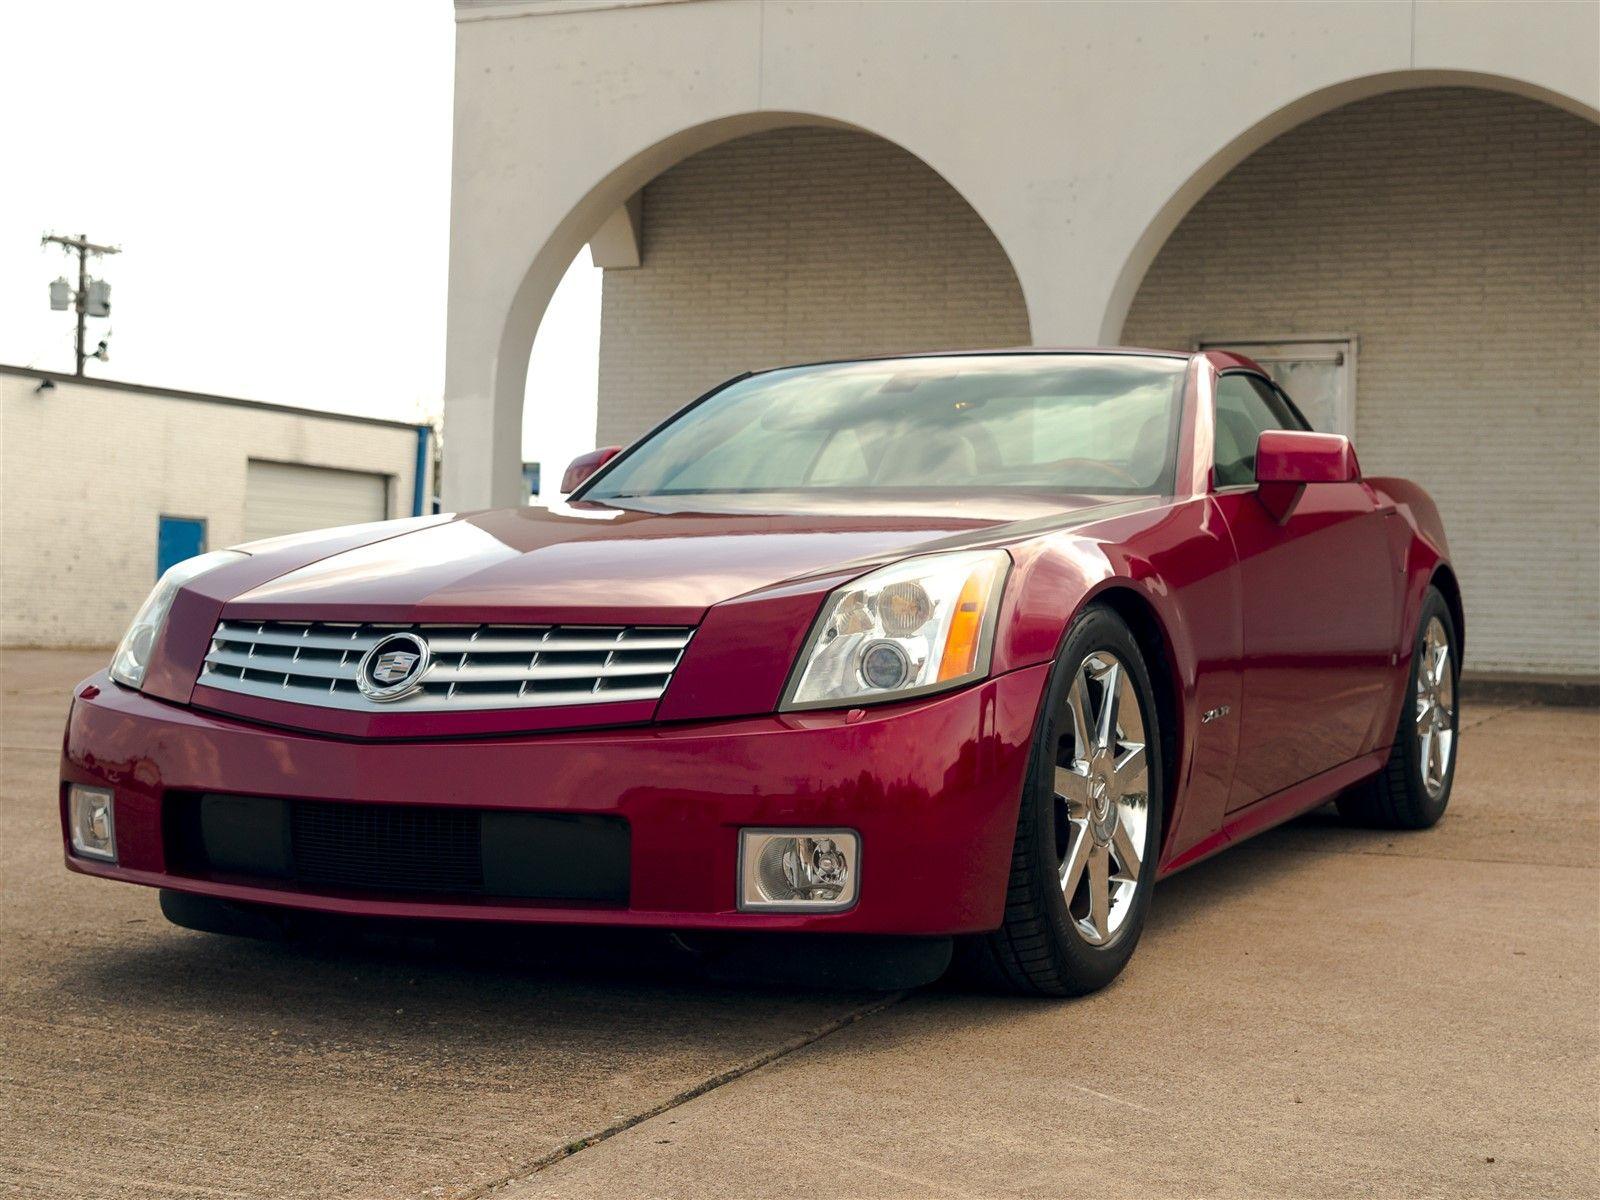 2008 cadillac xlr low mile clean carfax garland texas 75088 rh accelerateautogroup com Cadillac XLR V Supercharged 2004 Cadillac XLR Owner's Manual